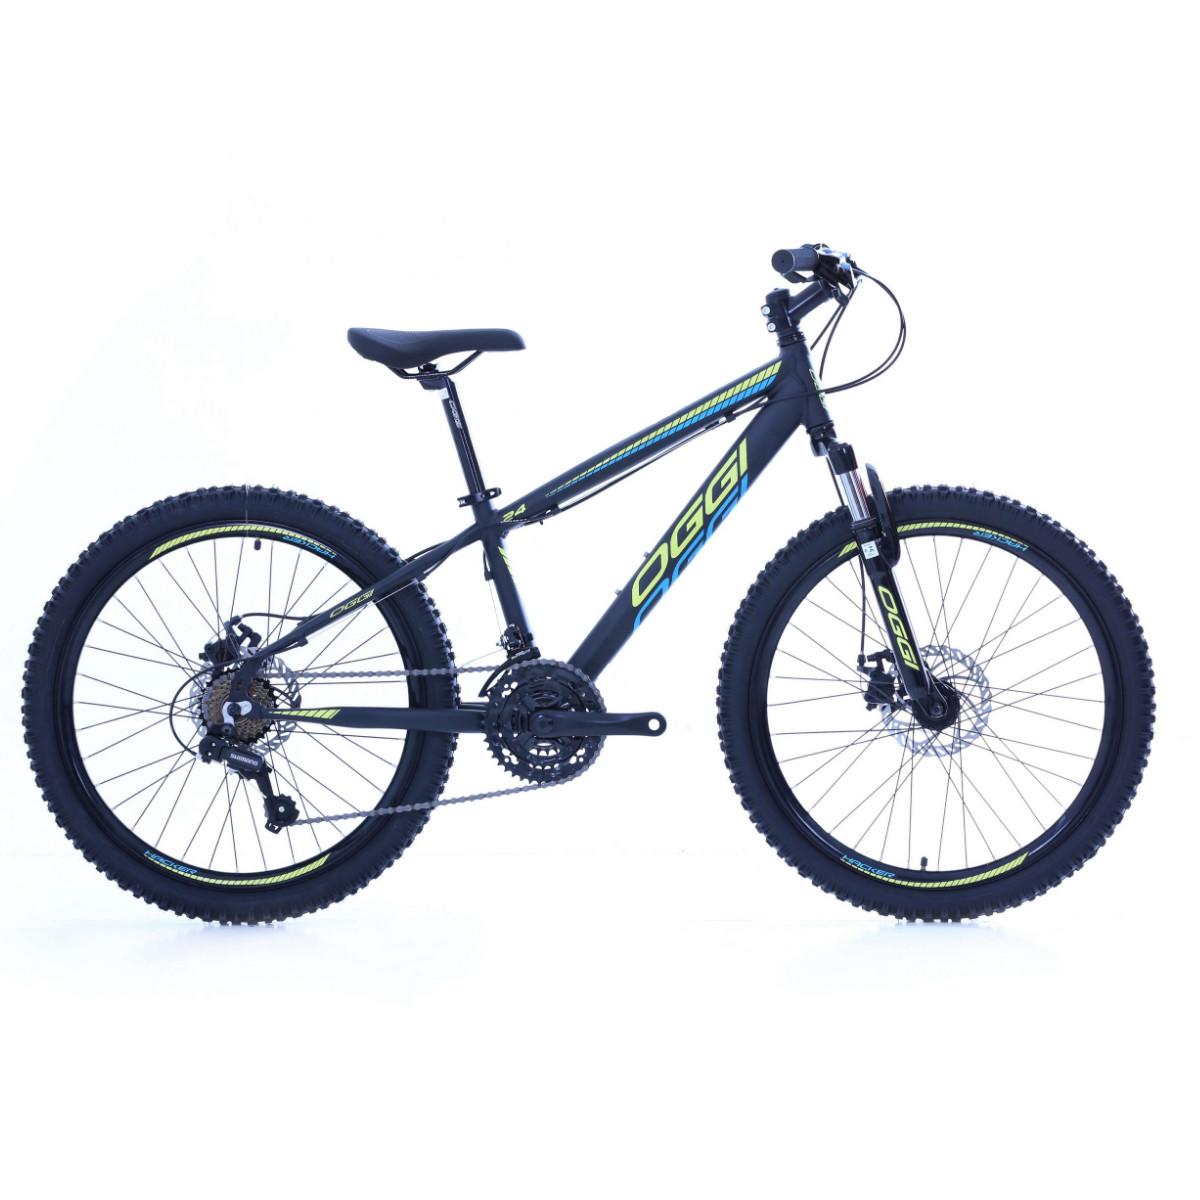 Bicicleta Oggi Hacker Sport Aro 24 - Preto Amarelo e Azul